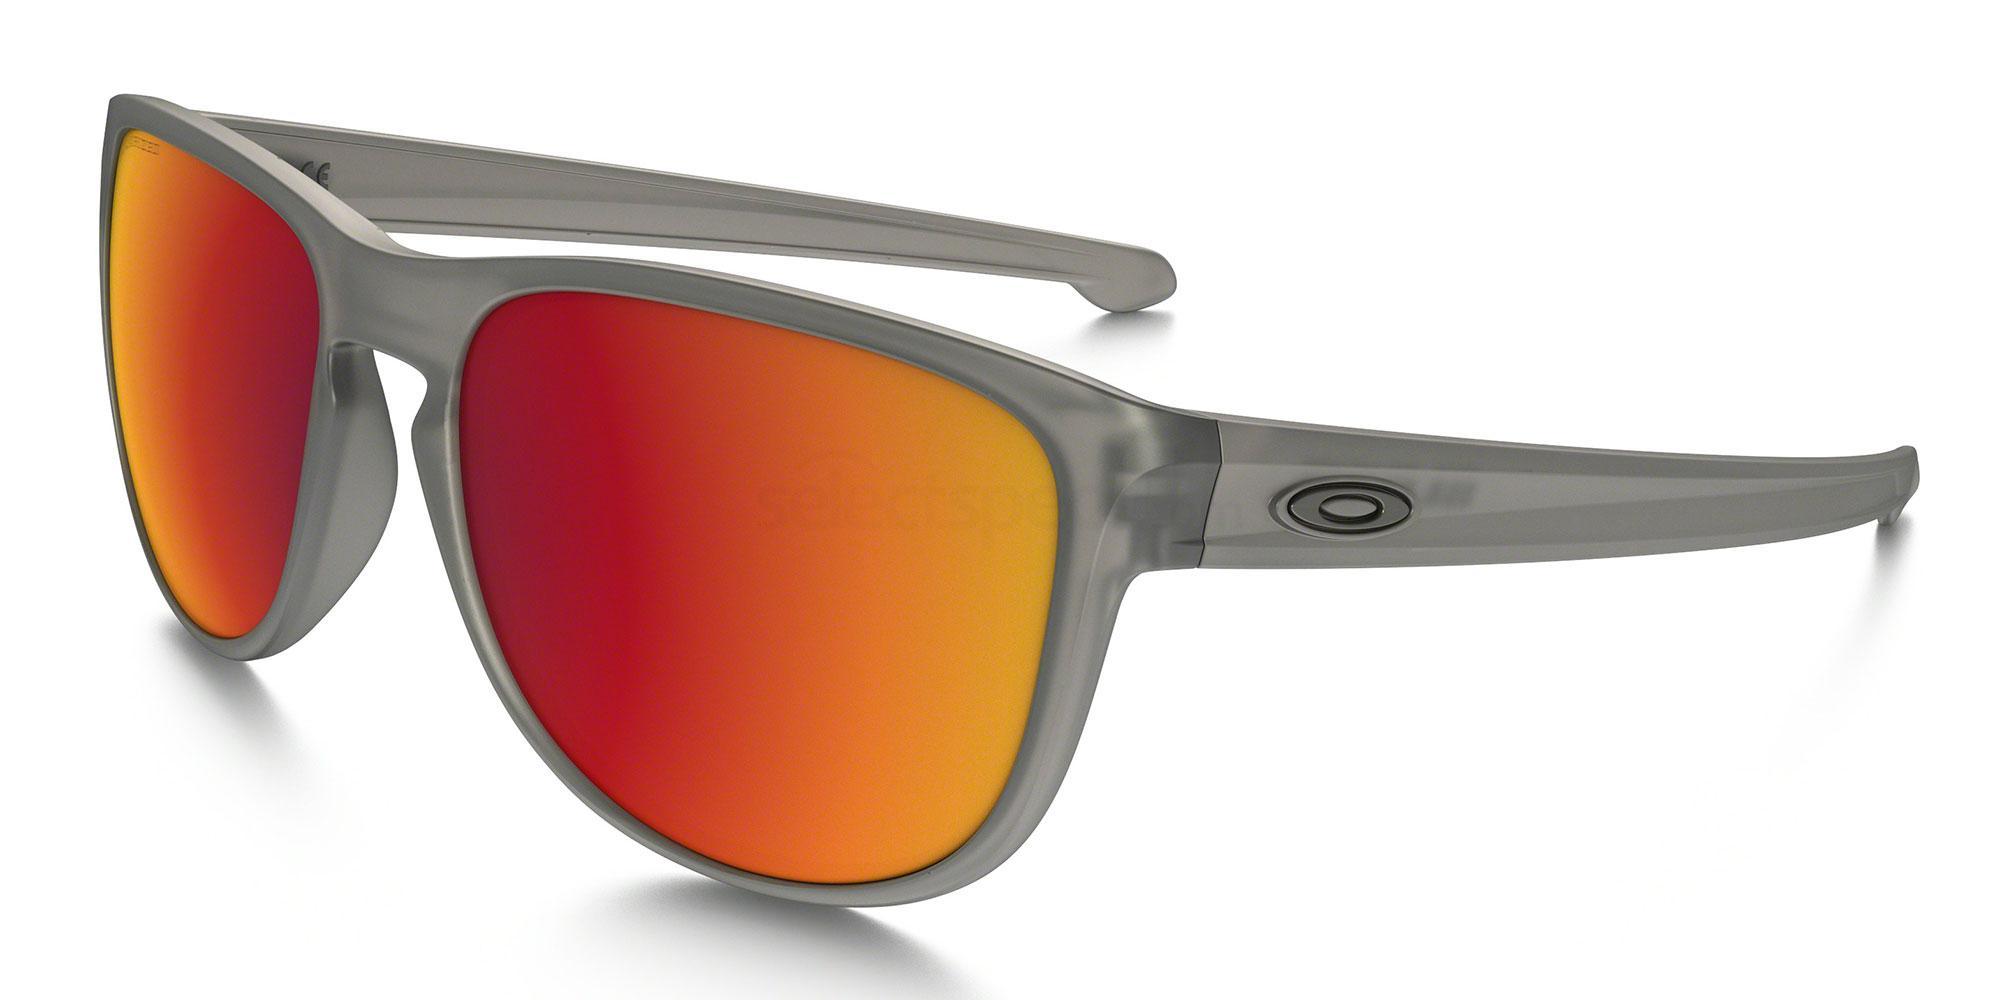 934203 OO9342 SLIVER R Sunglasses, Oakley